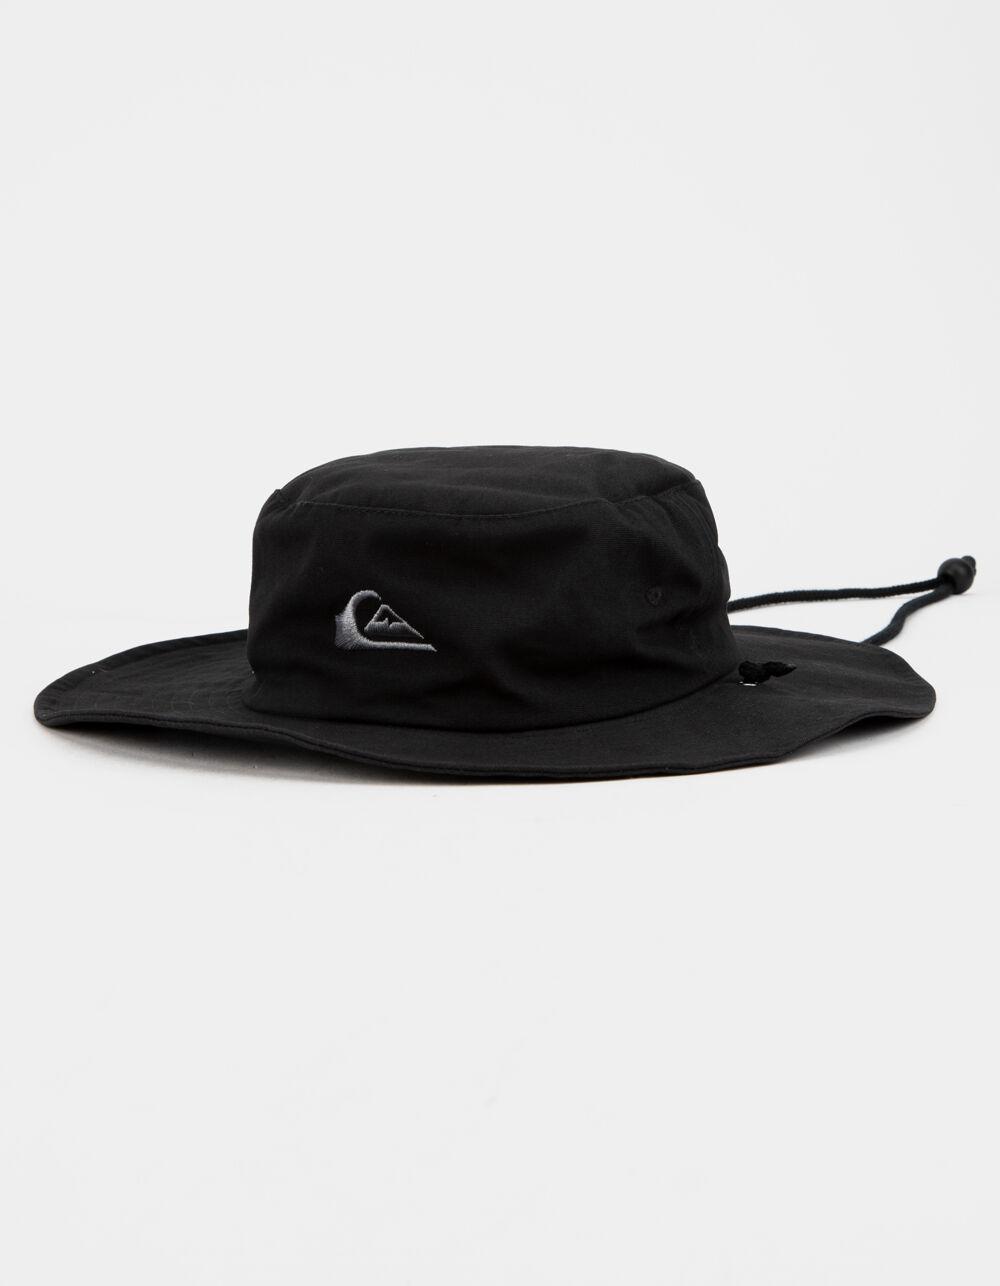 QUIKSILVER Bushmaster Black Bucket Hat